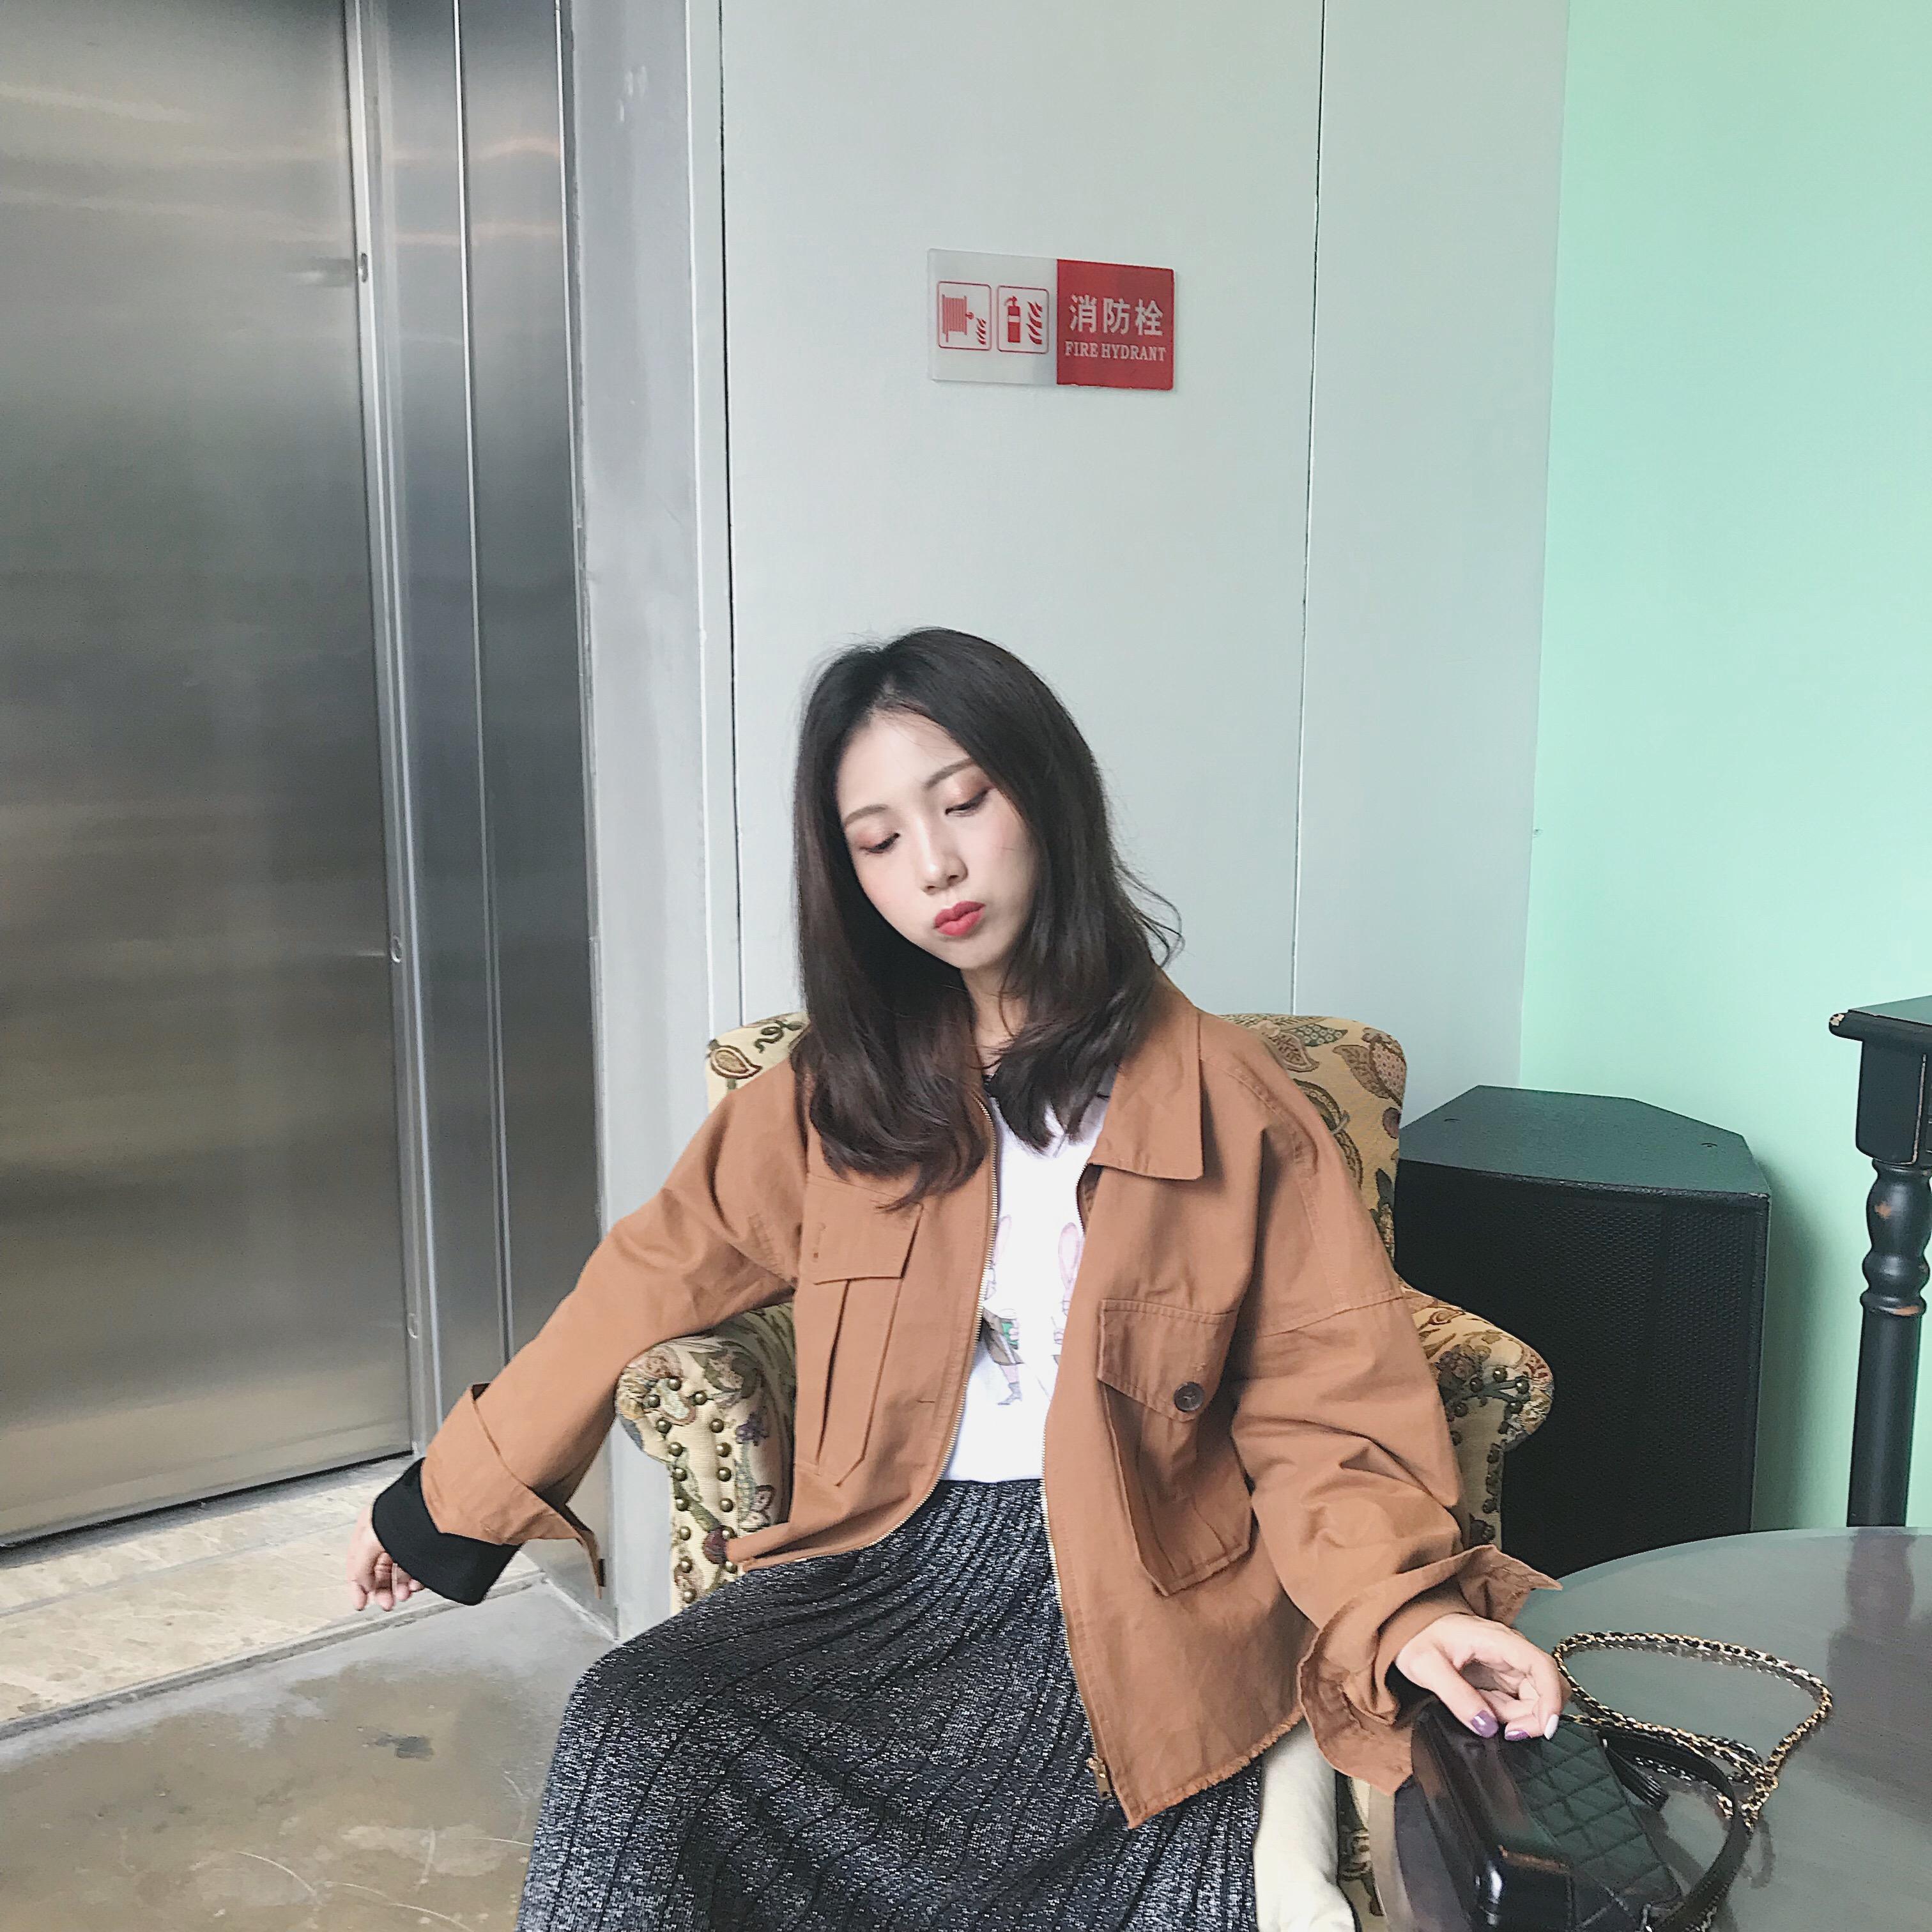 MINI XIN 2018秋季新款韩版ulzzang潮港味复古宽松毛边工装短外套